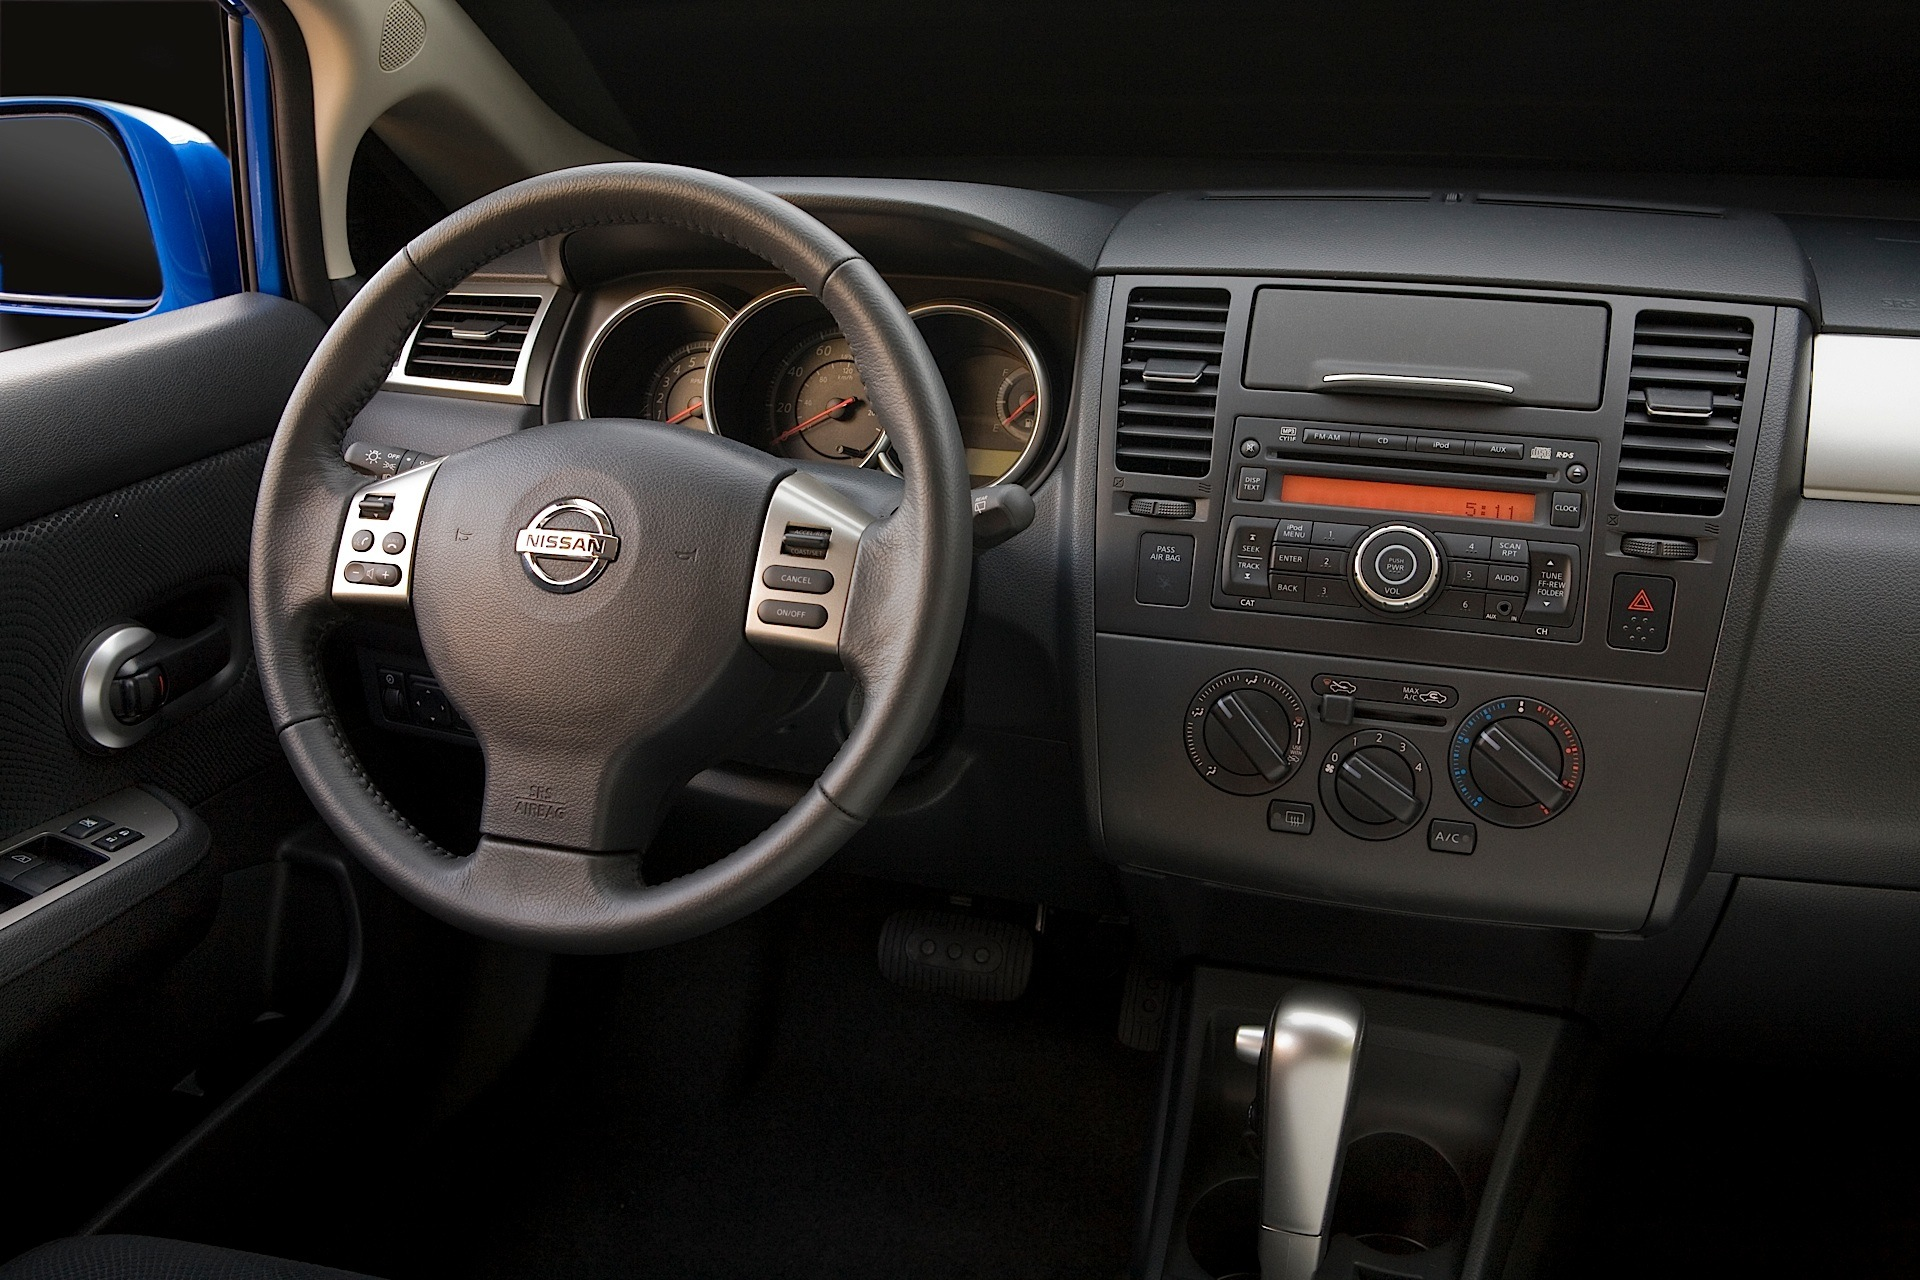 saturn engine diagram nissan tiida versa sedan specs  amp  photos 2011  2012  2013  nissan tiida versa sedan specs  amp  photos 2011  2012  2013